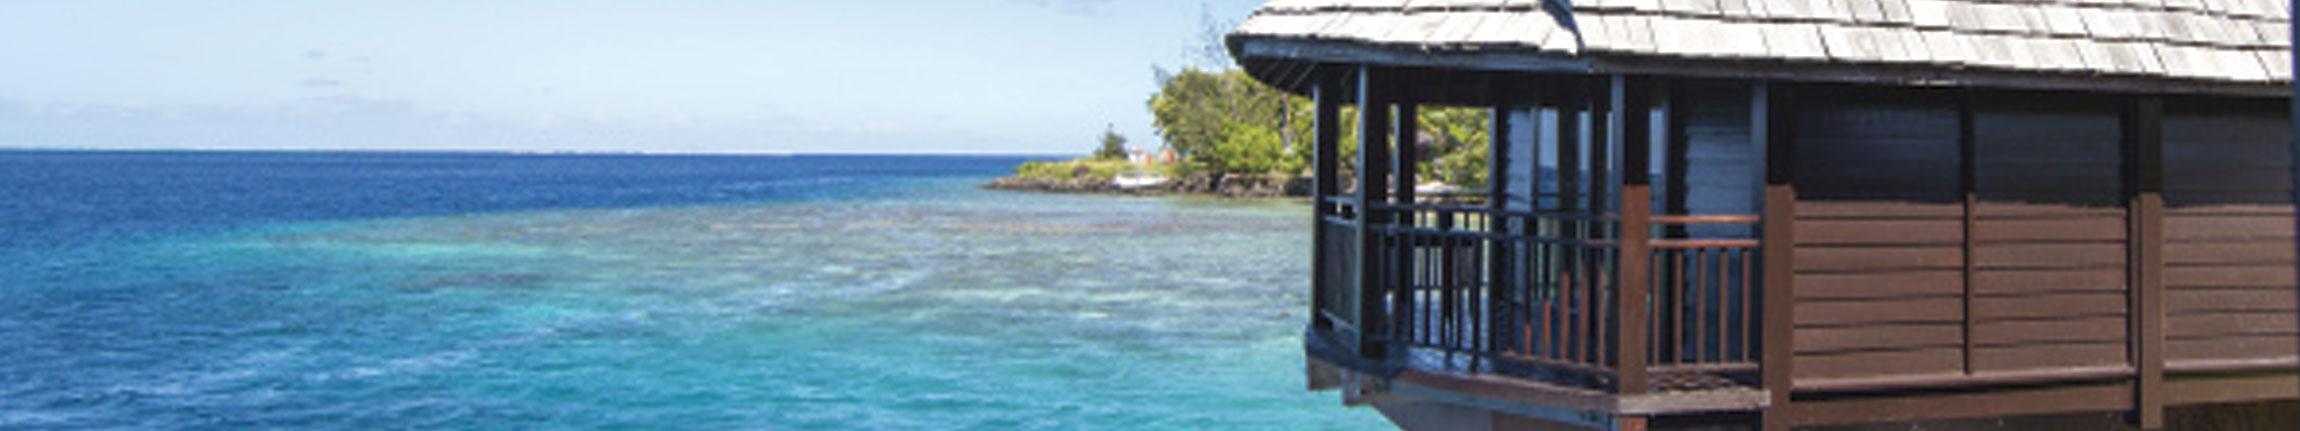 Bora Plaque De Cuisson oa oa lodge bora bora- voyagez avec e-tahiti travel